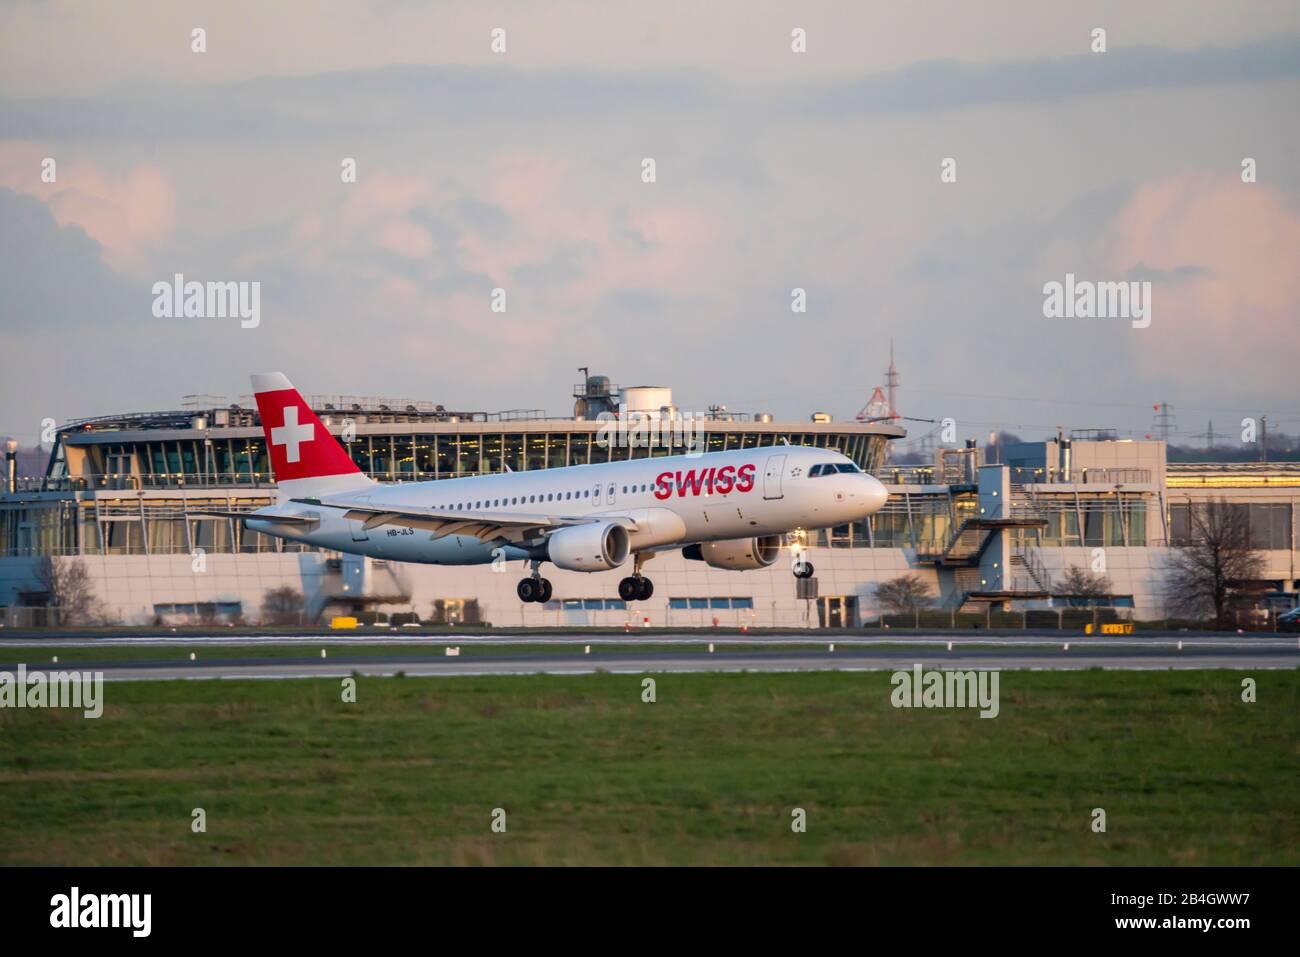 DŸsseldorf International Airport, DUS, aircraft on landing, SWISS, Airbus, Stock Photo